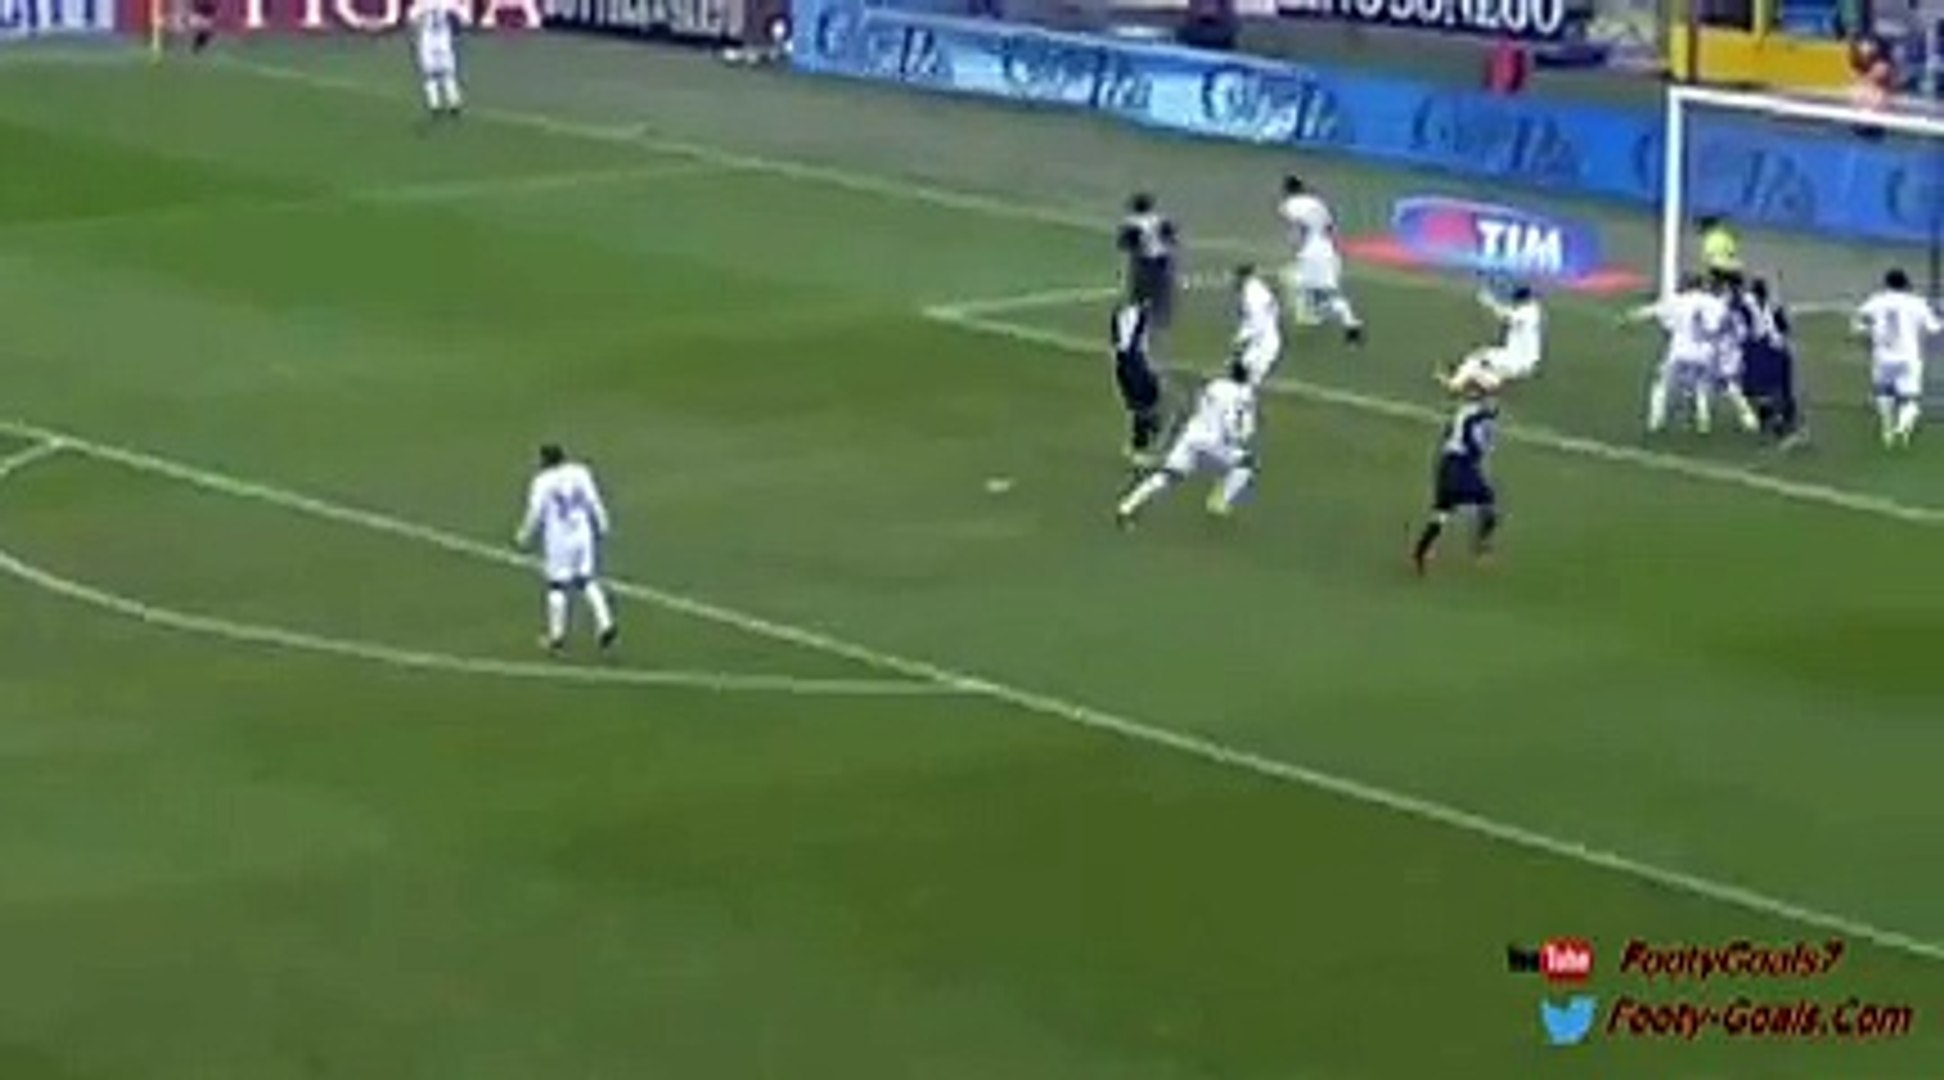 Alejandro Gomez scores direct from the corner Atalanta vs Carpi 2-0 (Serie A 2015)